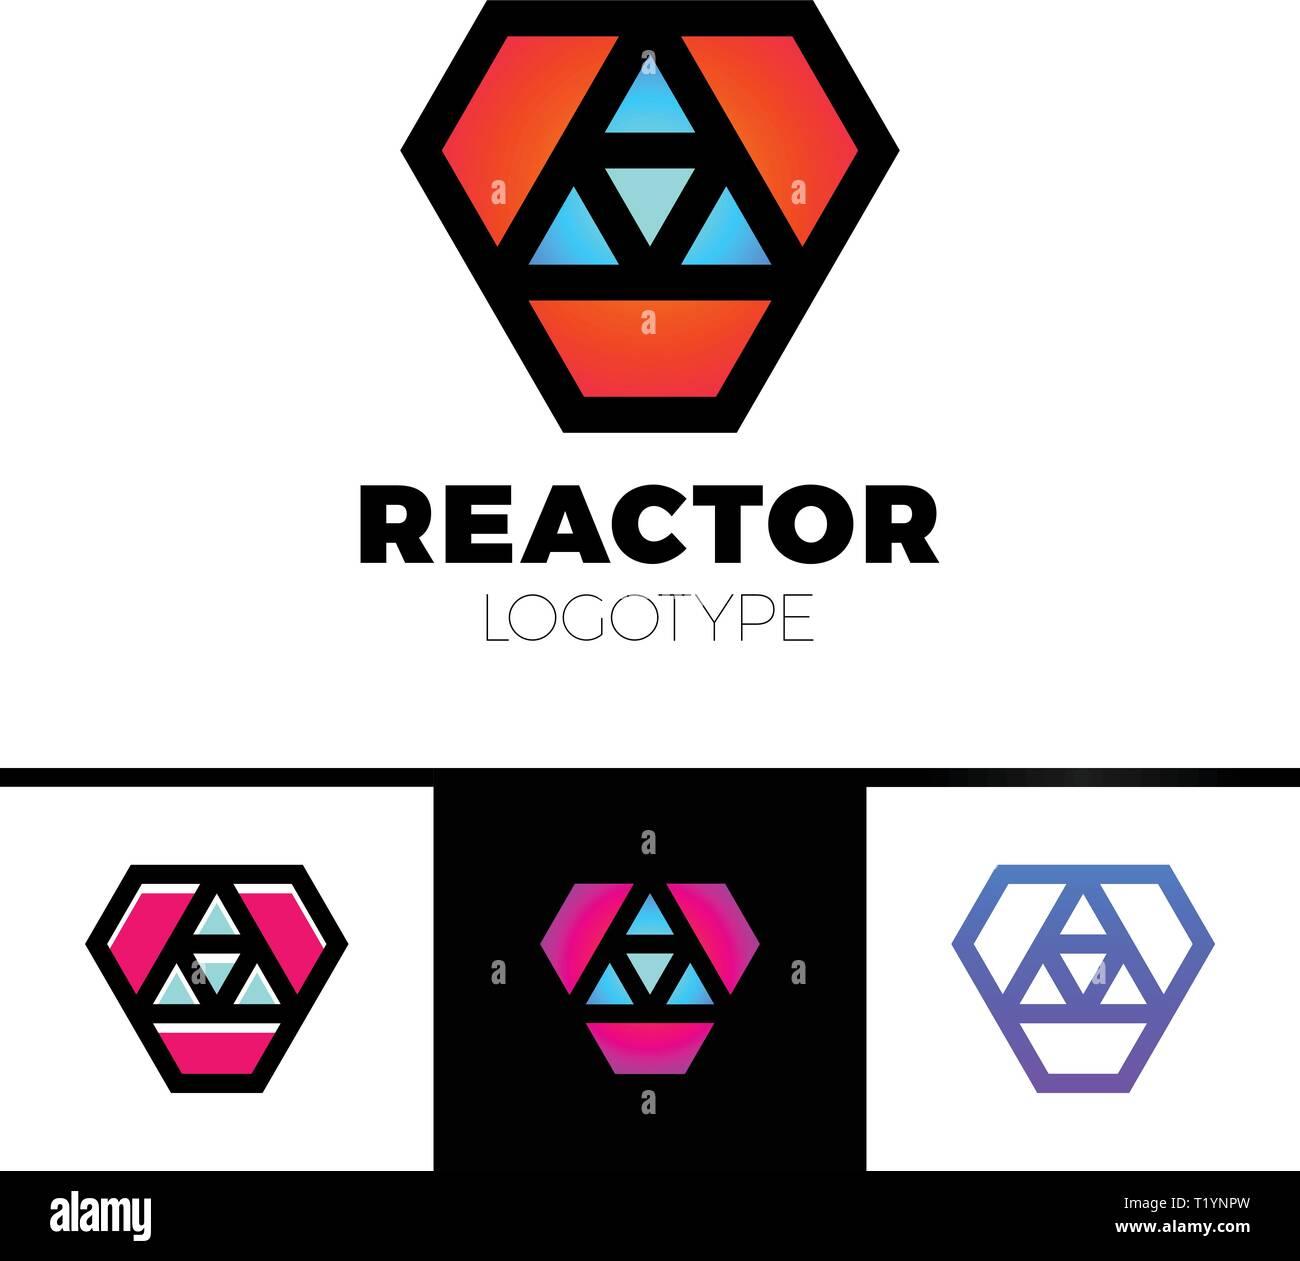 Triangle logotype or Trinity Arrow Reactor Logo. - Stock Vector